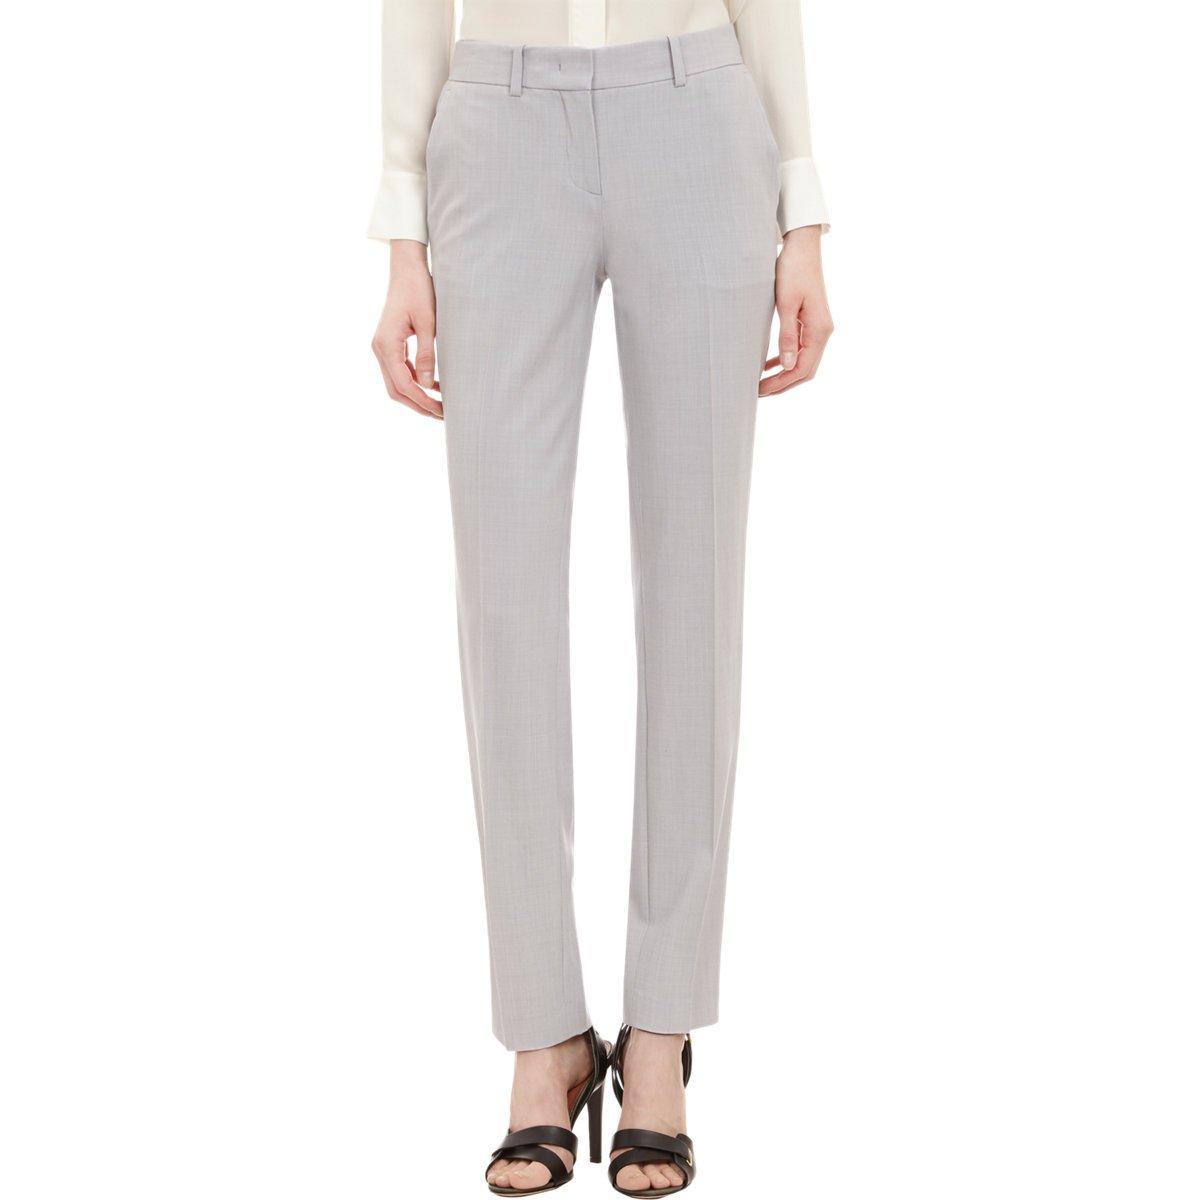 Theory Super Slim Pants, Light Heather, 0